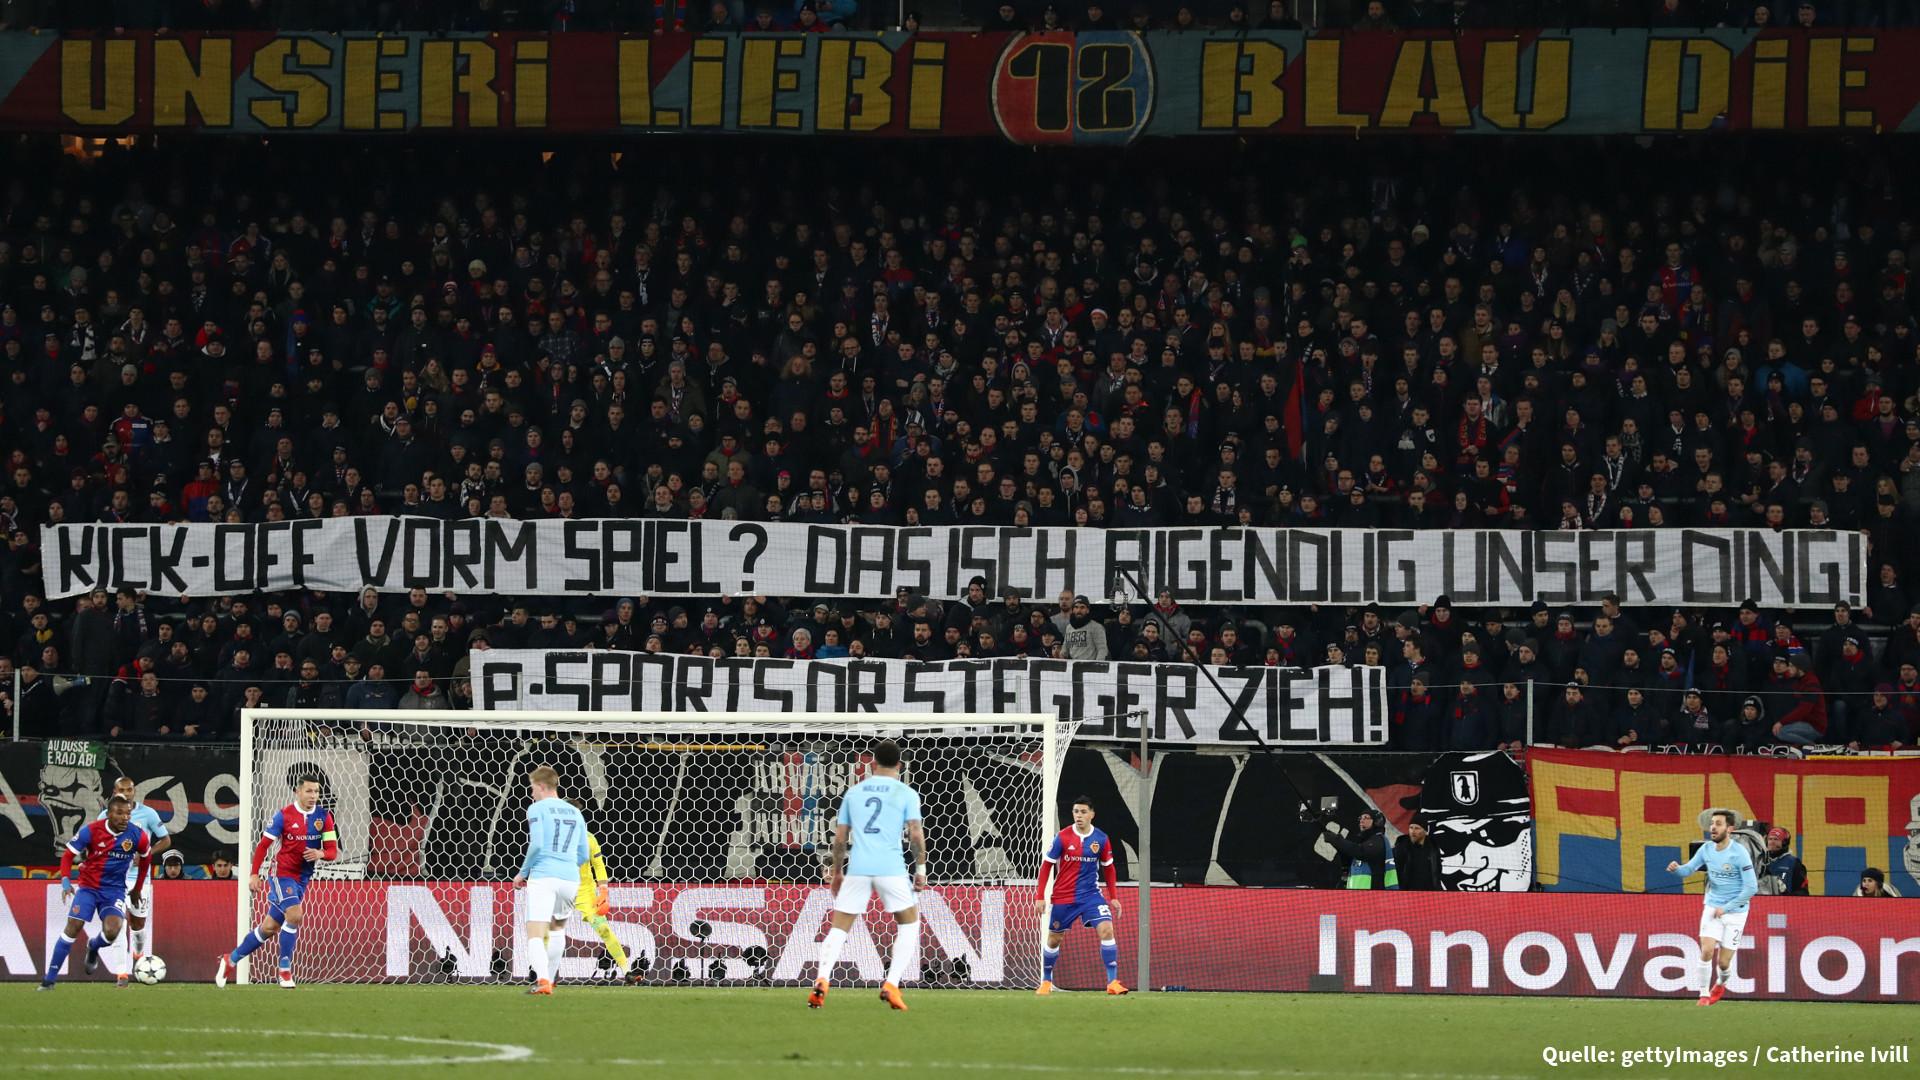 Protest Gegen E Sport Fussball Fans Sorgen Wohl Fur